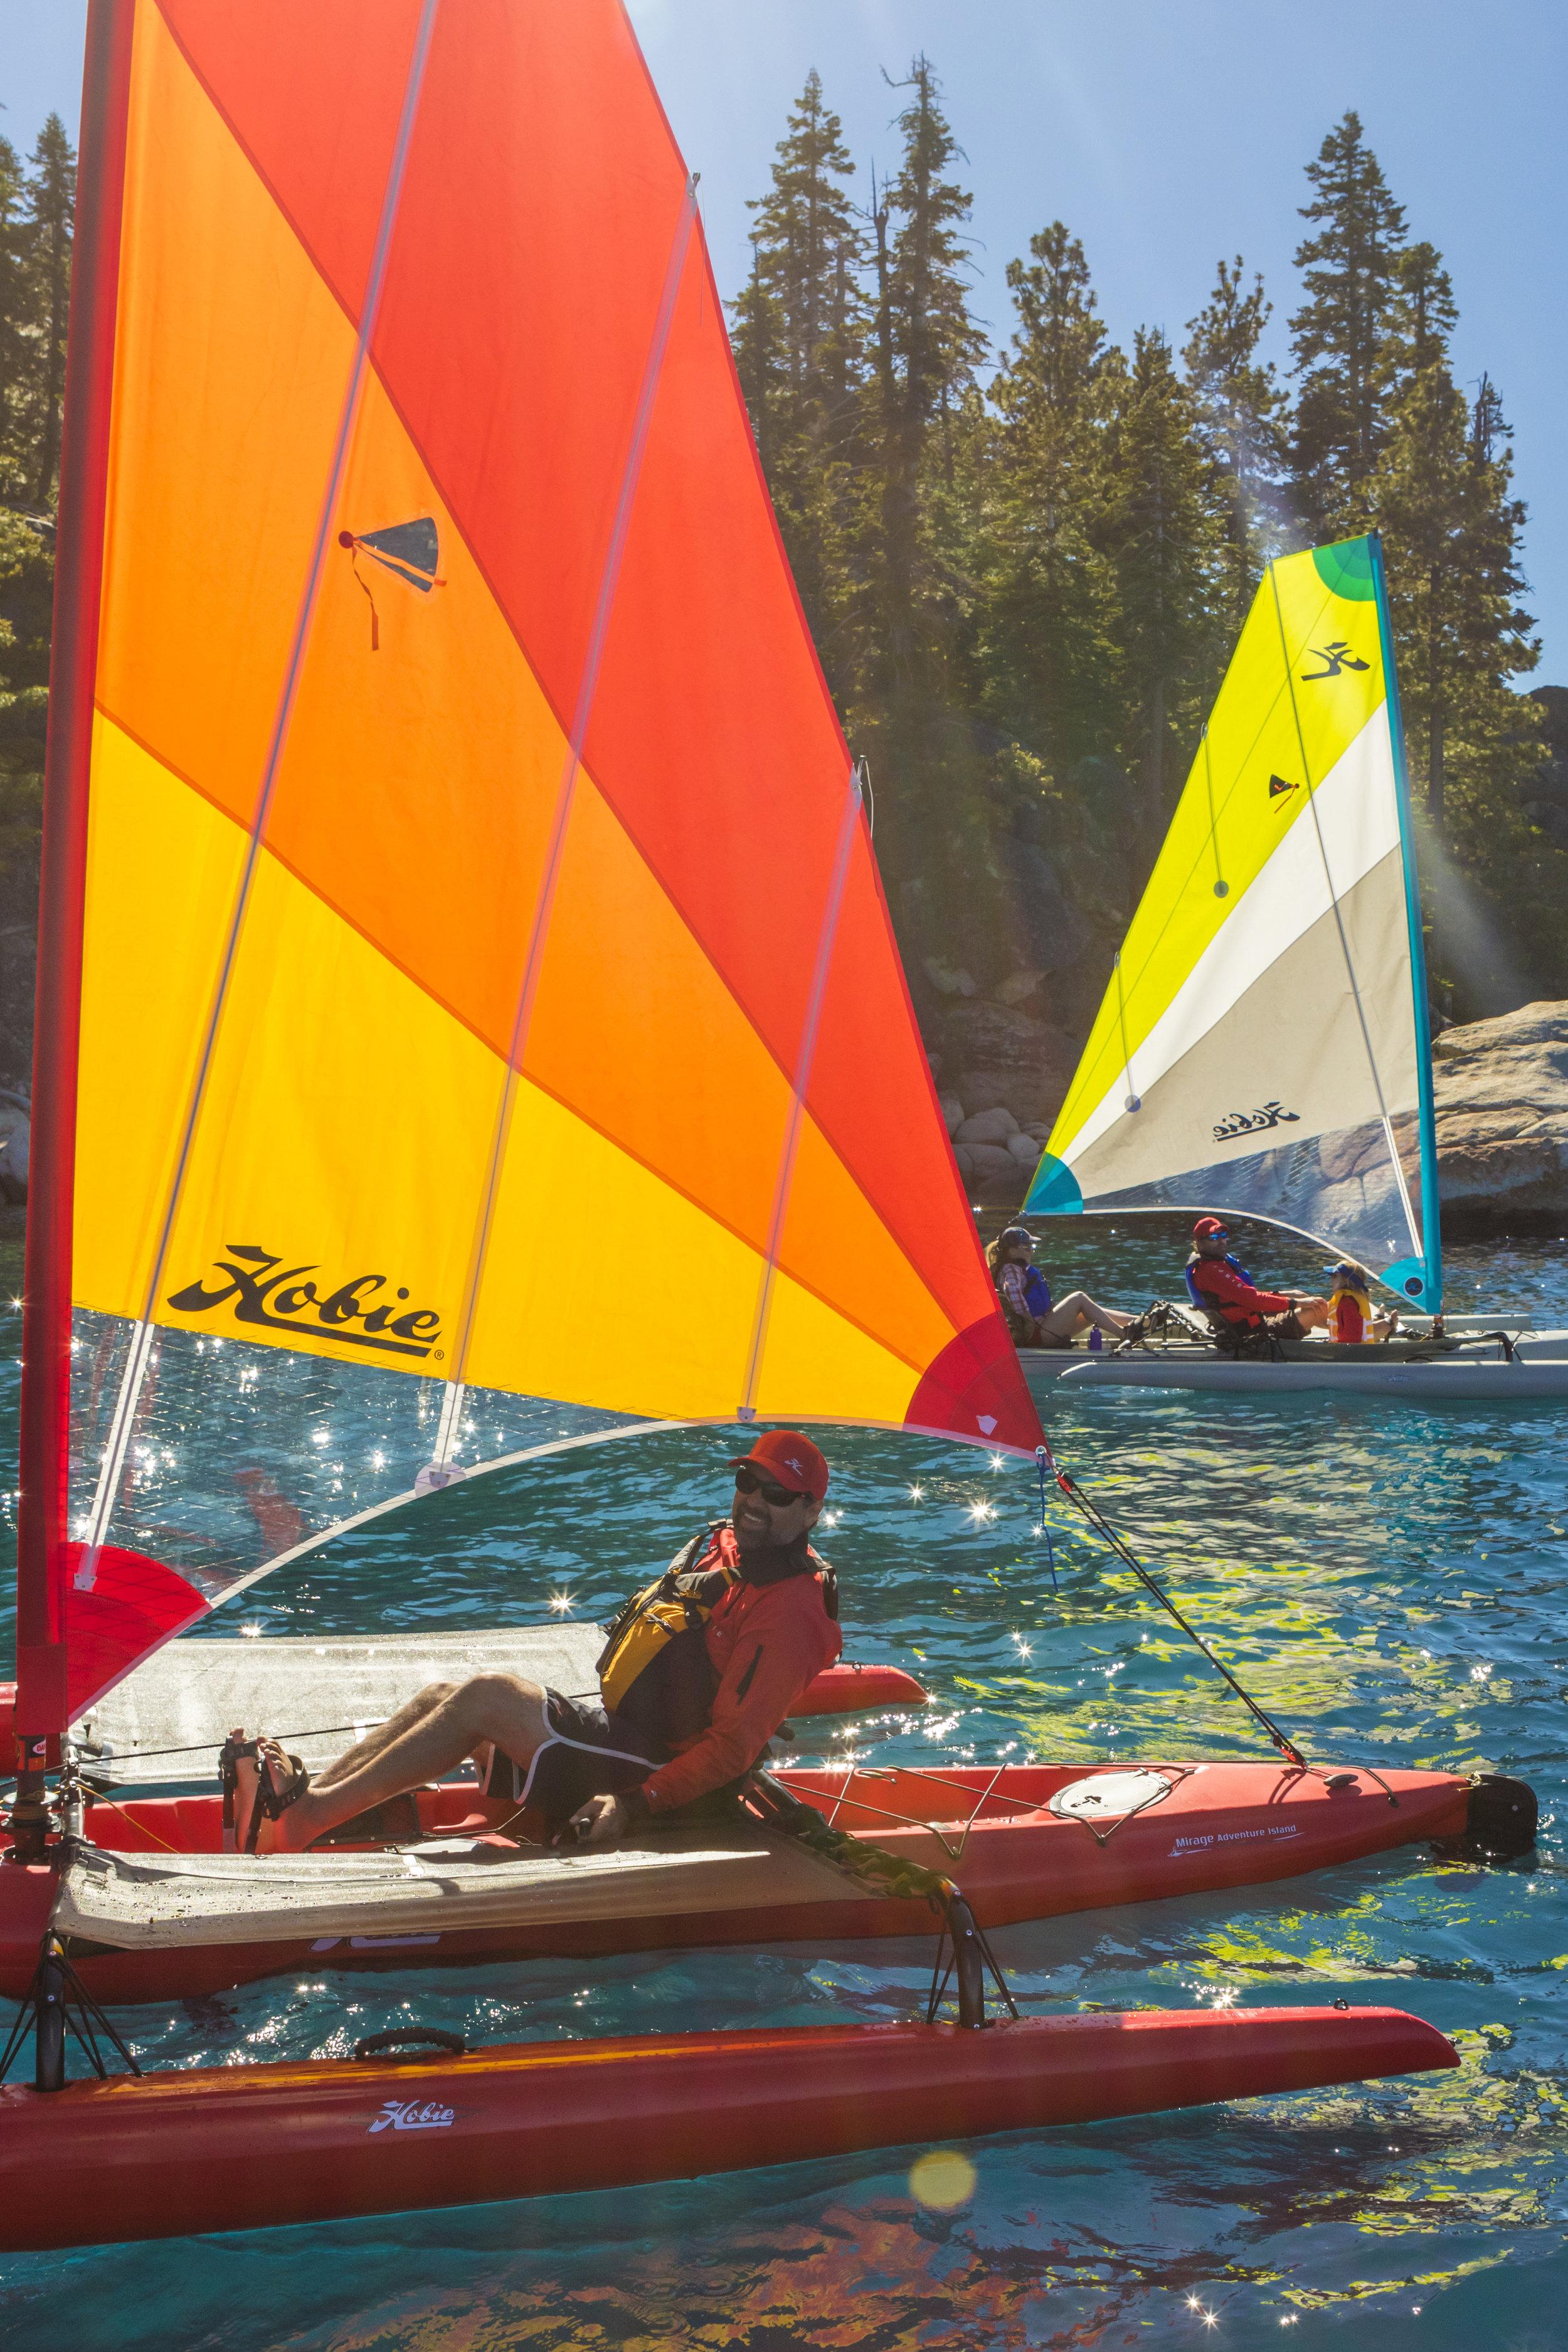 Islands_action_Tahoe_red_dune_vertical_2715_full.jpg